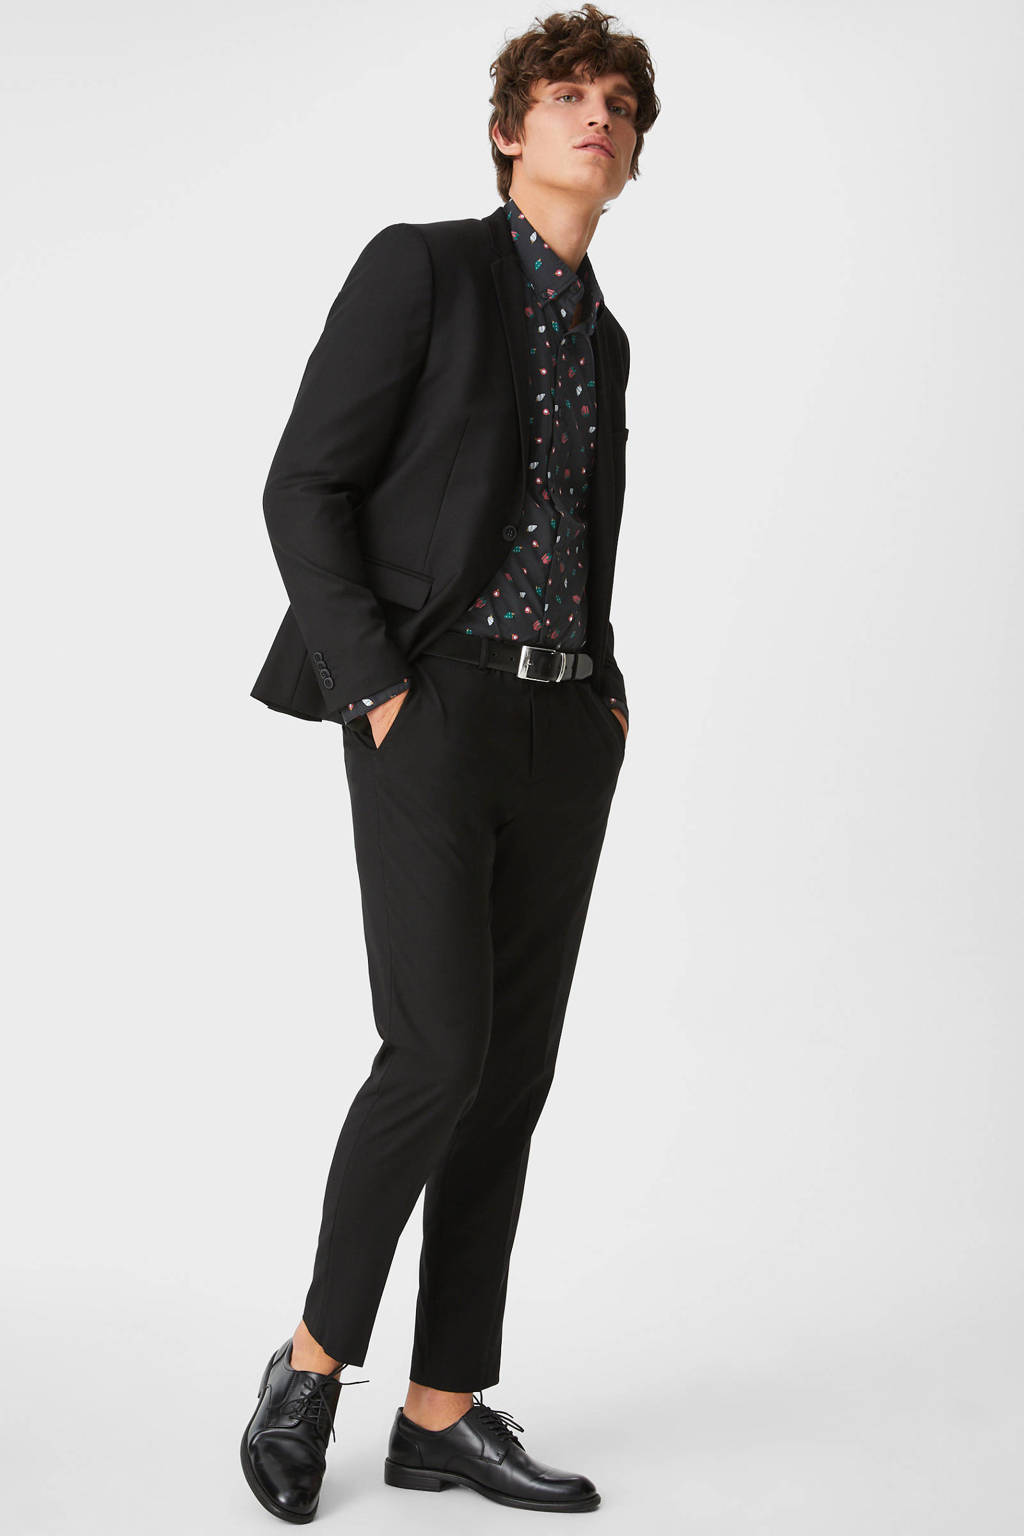 C&A Angelo Litrico slim fit overhemd met all over print zwart, Zwart